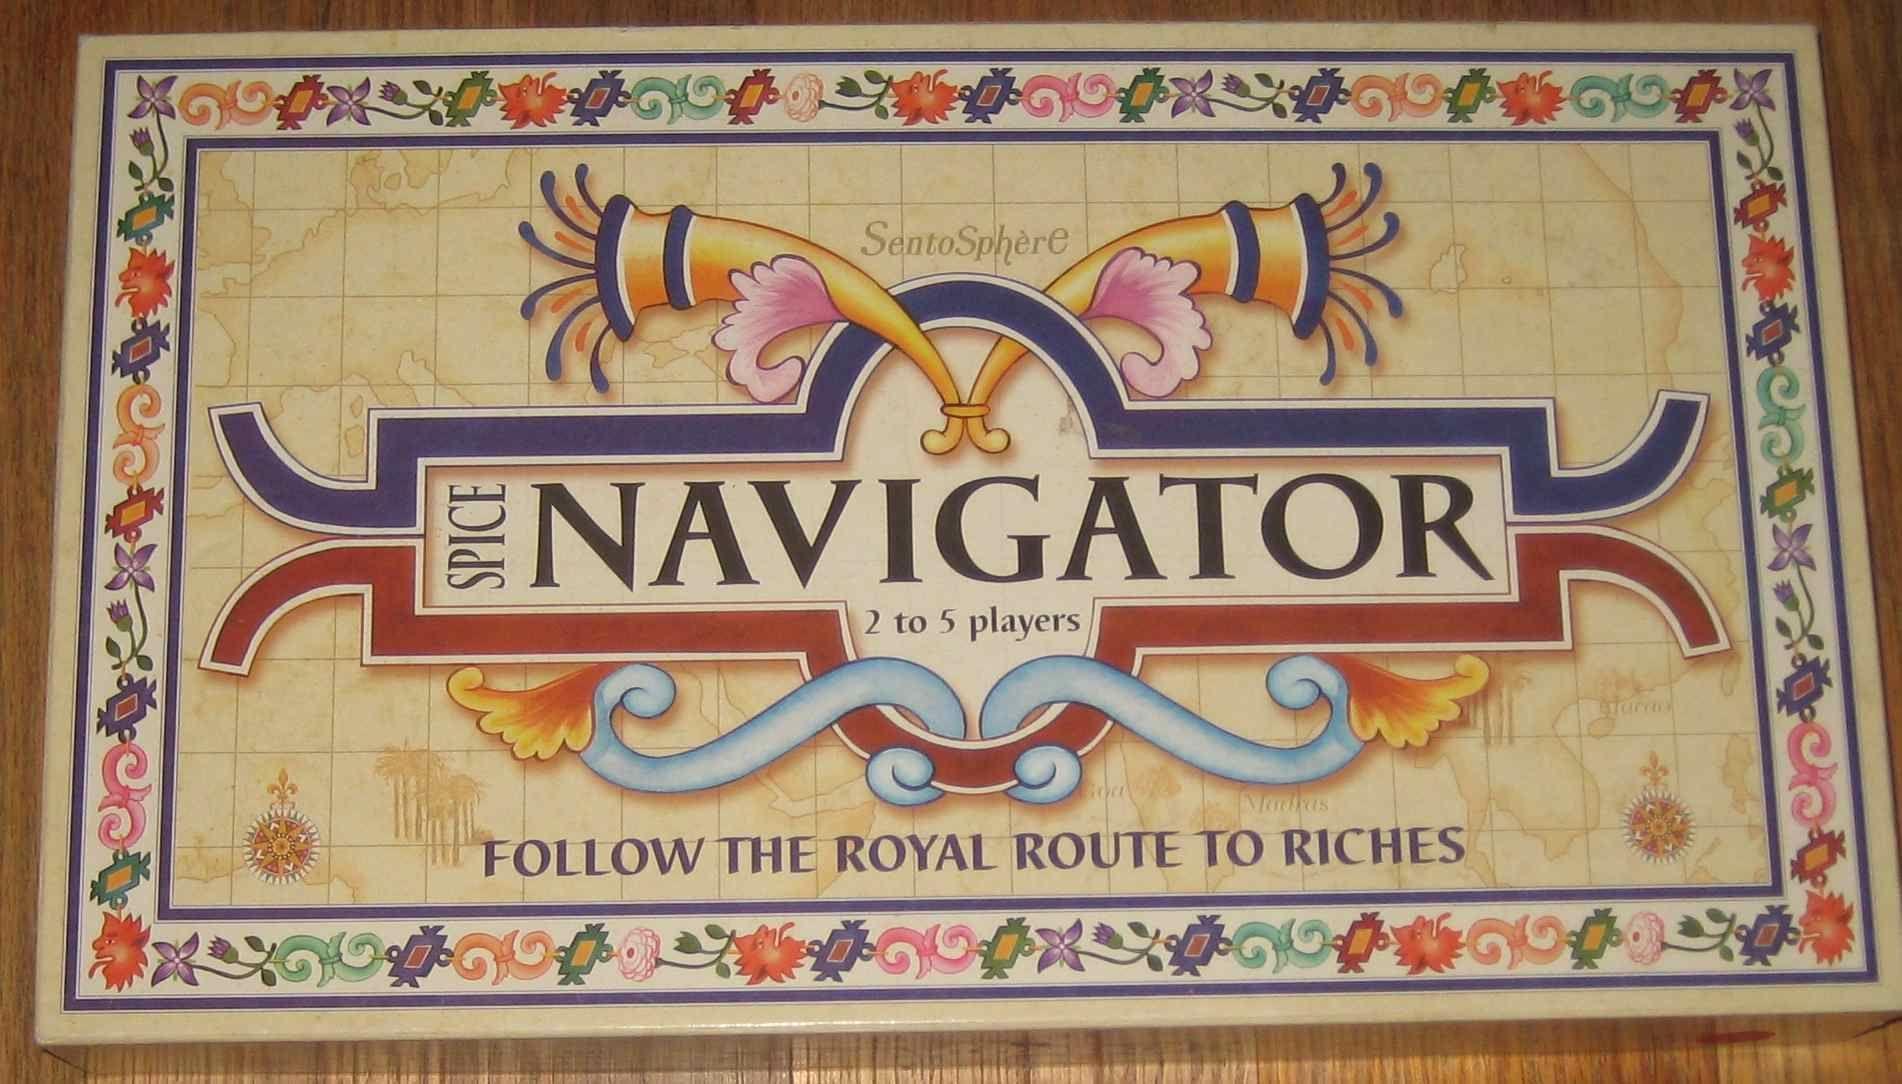 Spice Navigator